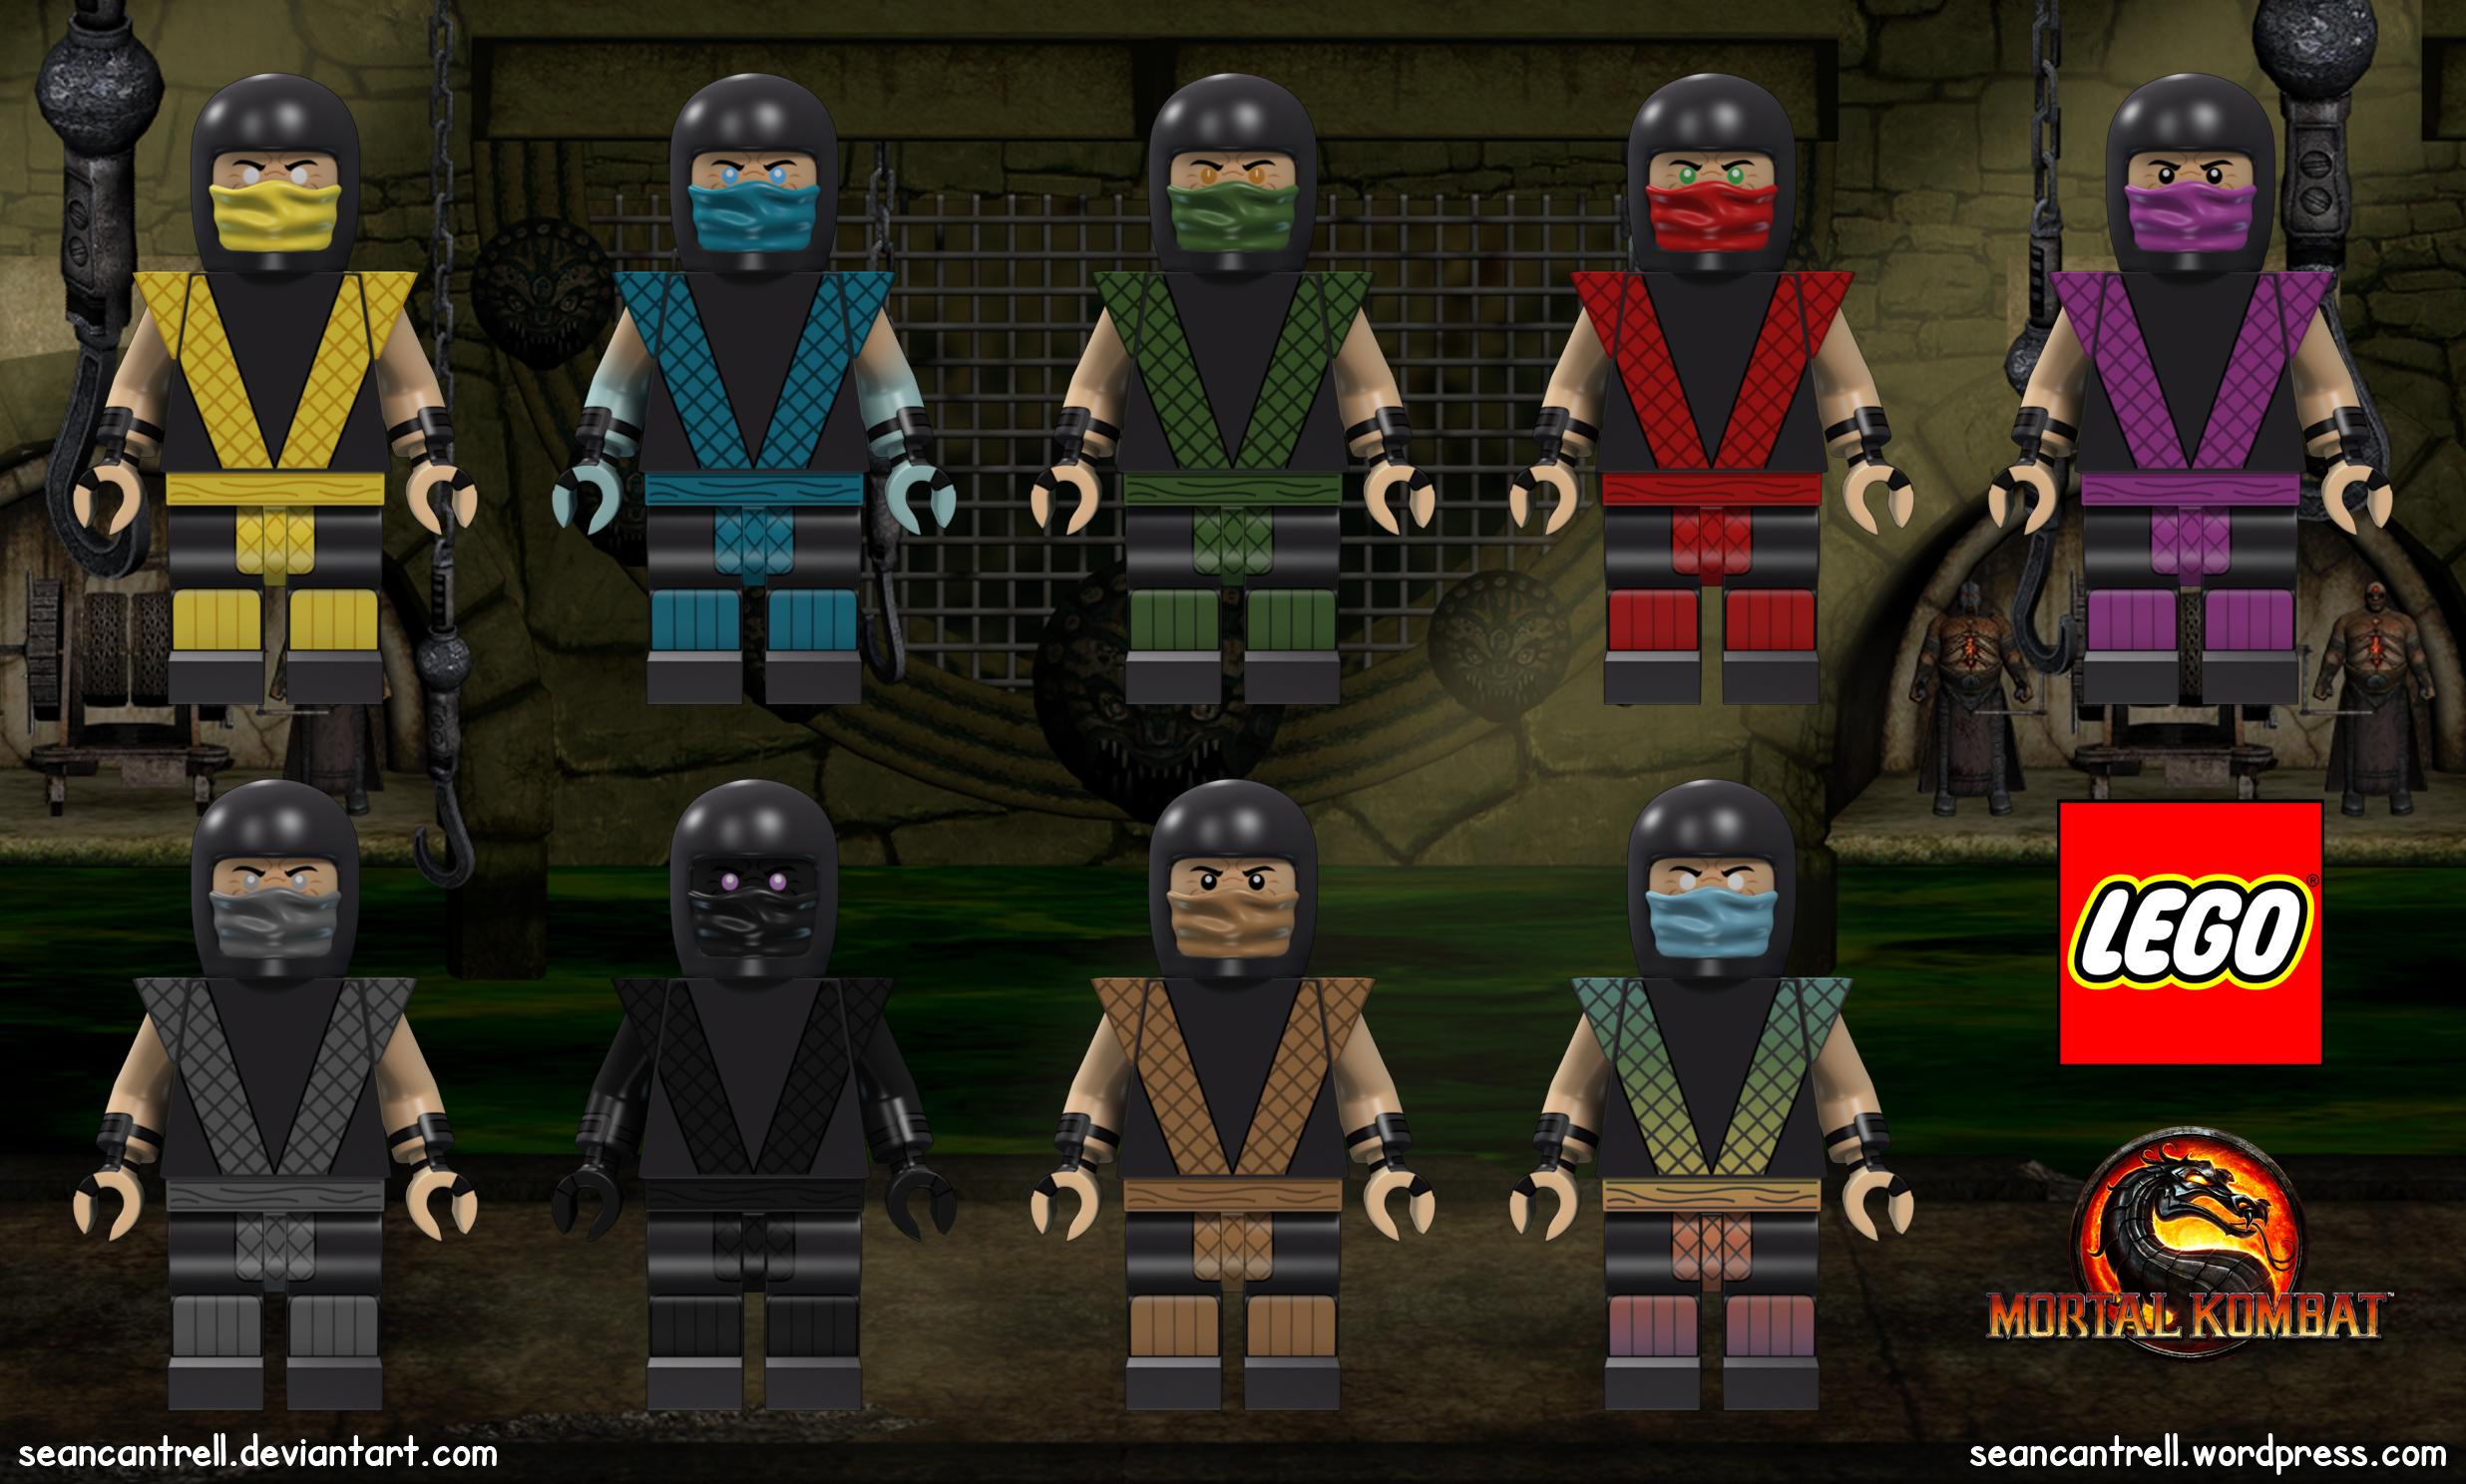 Lego Mortal Kombat Minifigures – Male Ninja | Sean Cantrell